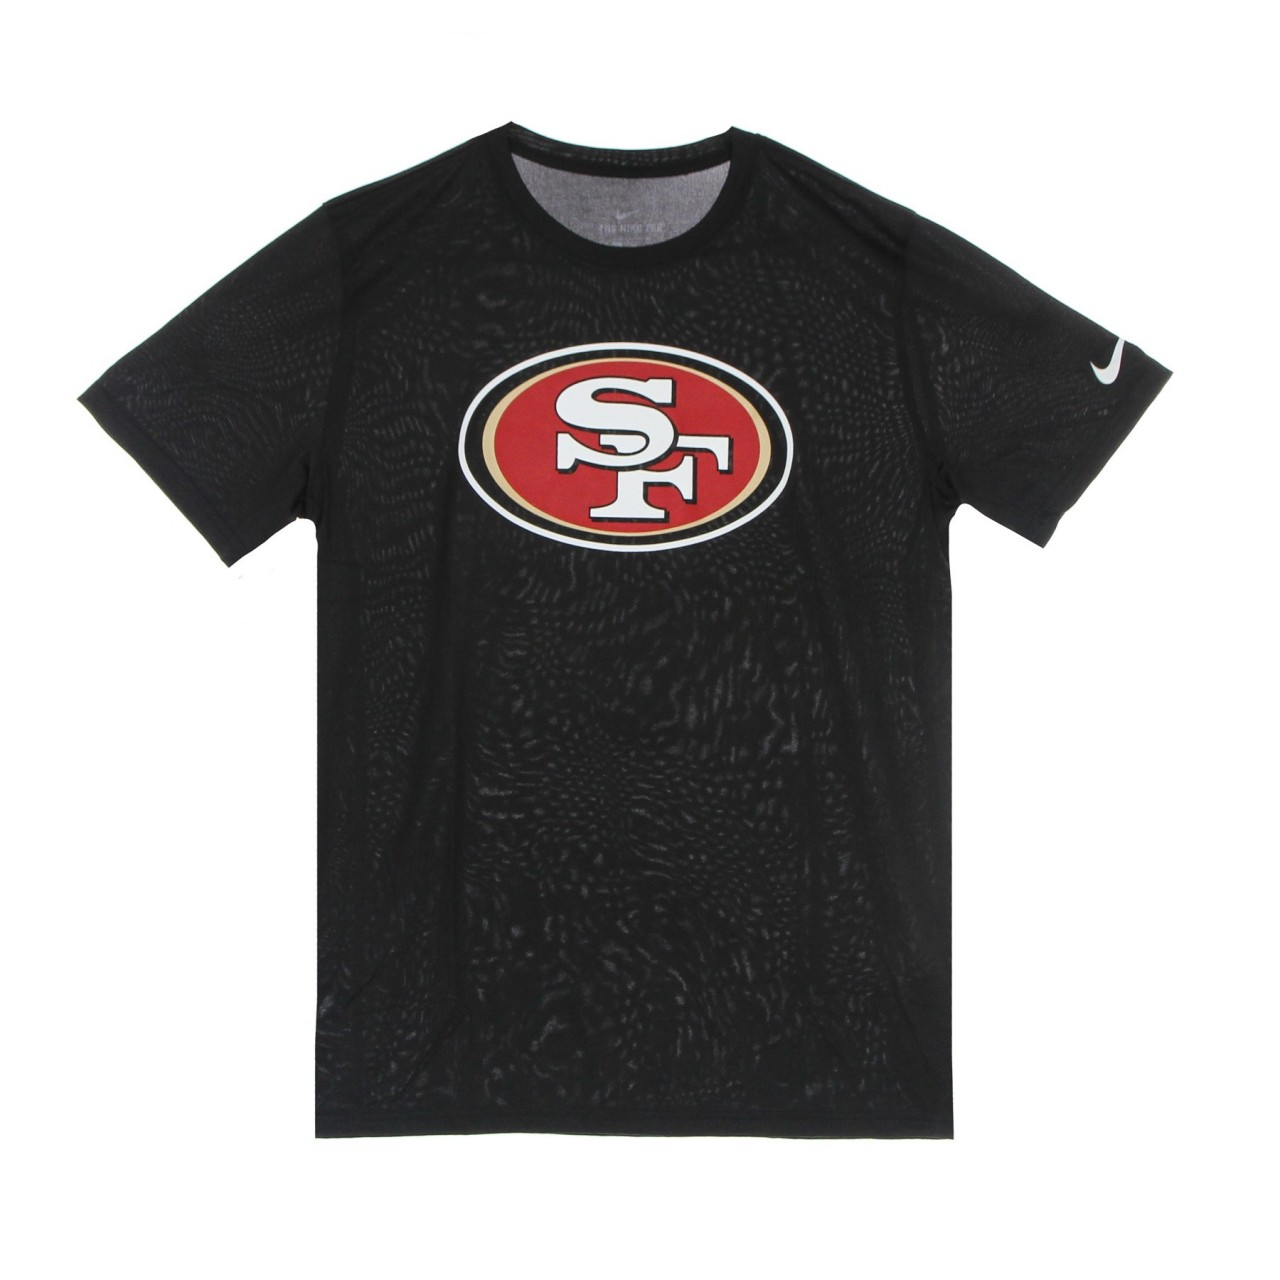 NIKE NFL NFL LOGO LEGEND TEE SAF49E N922-00A-73-CX5